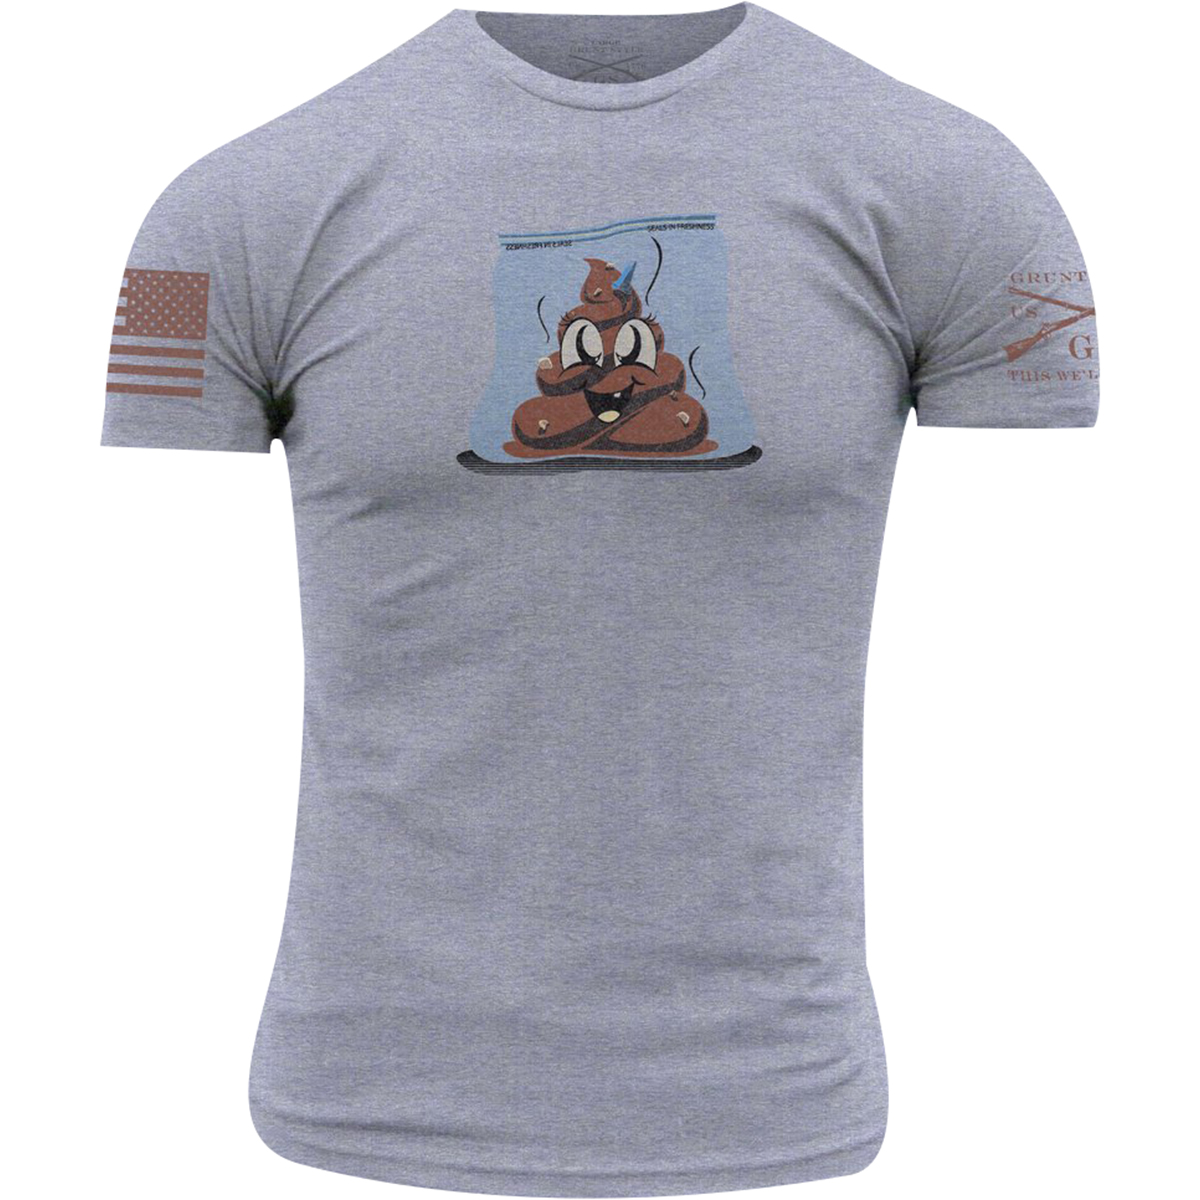 Heather Gray Grunt Style Sh*t Bag T-Shirt